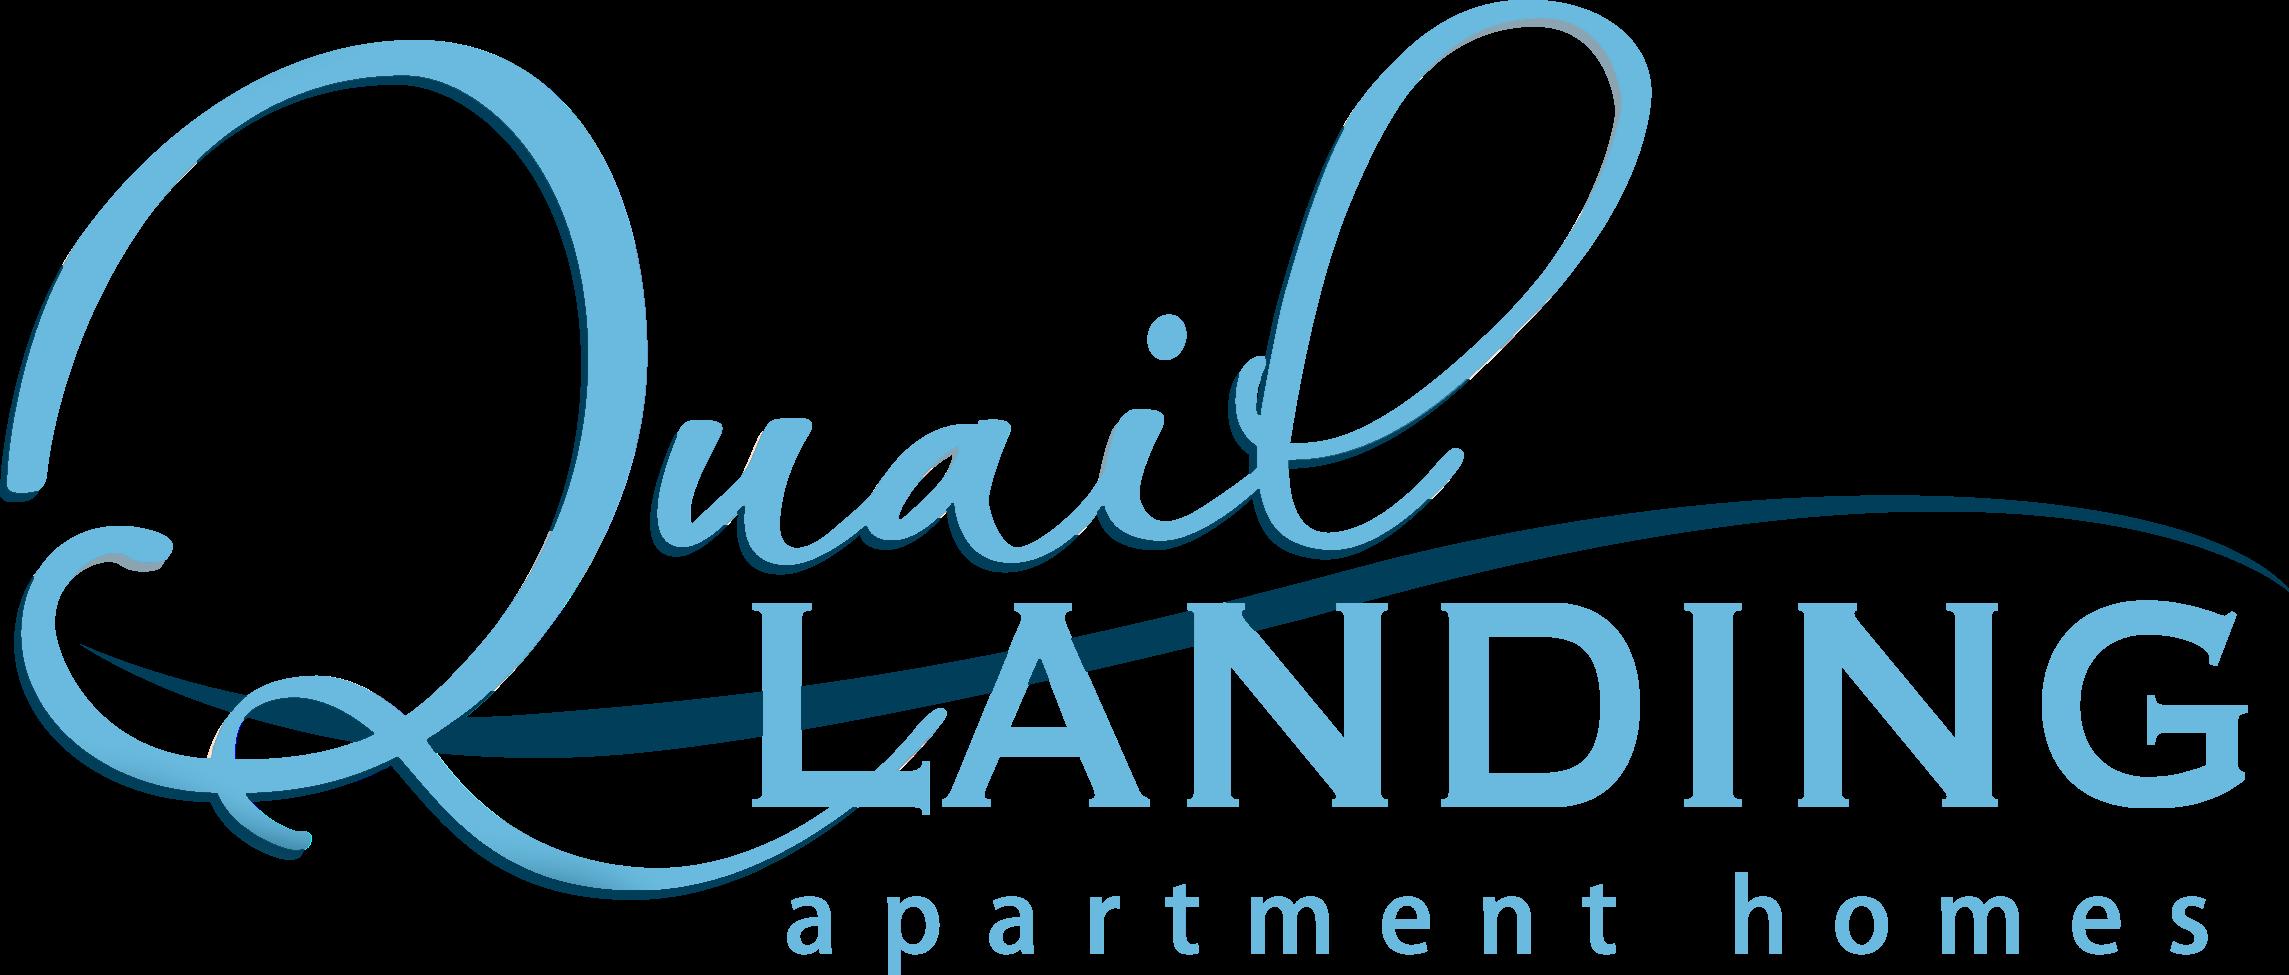 Quail Landing Apartment Homes Apartments In Oklahoma